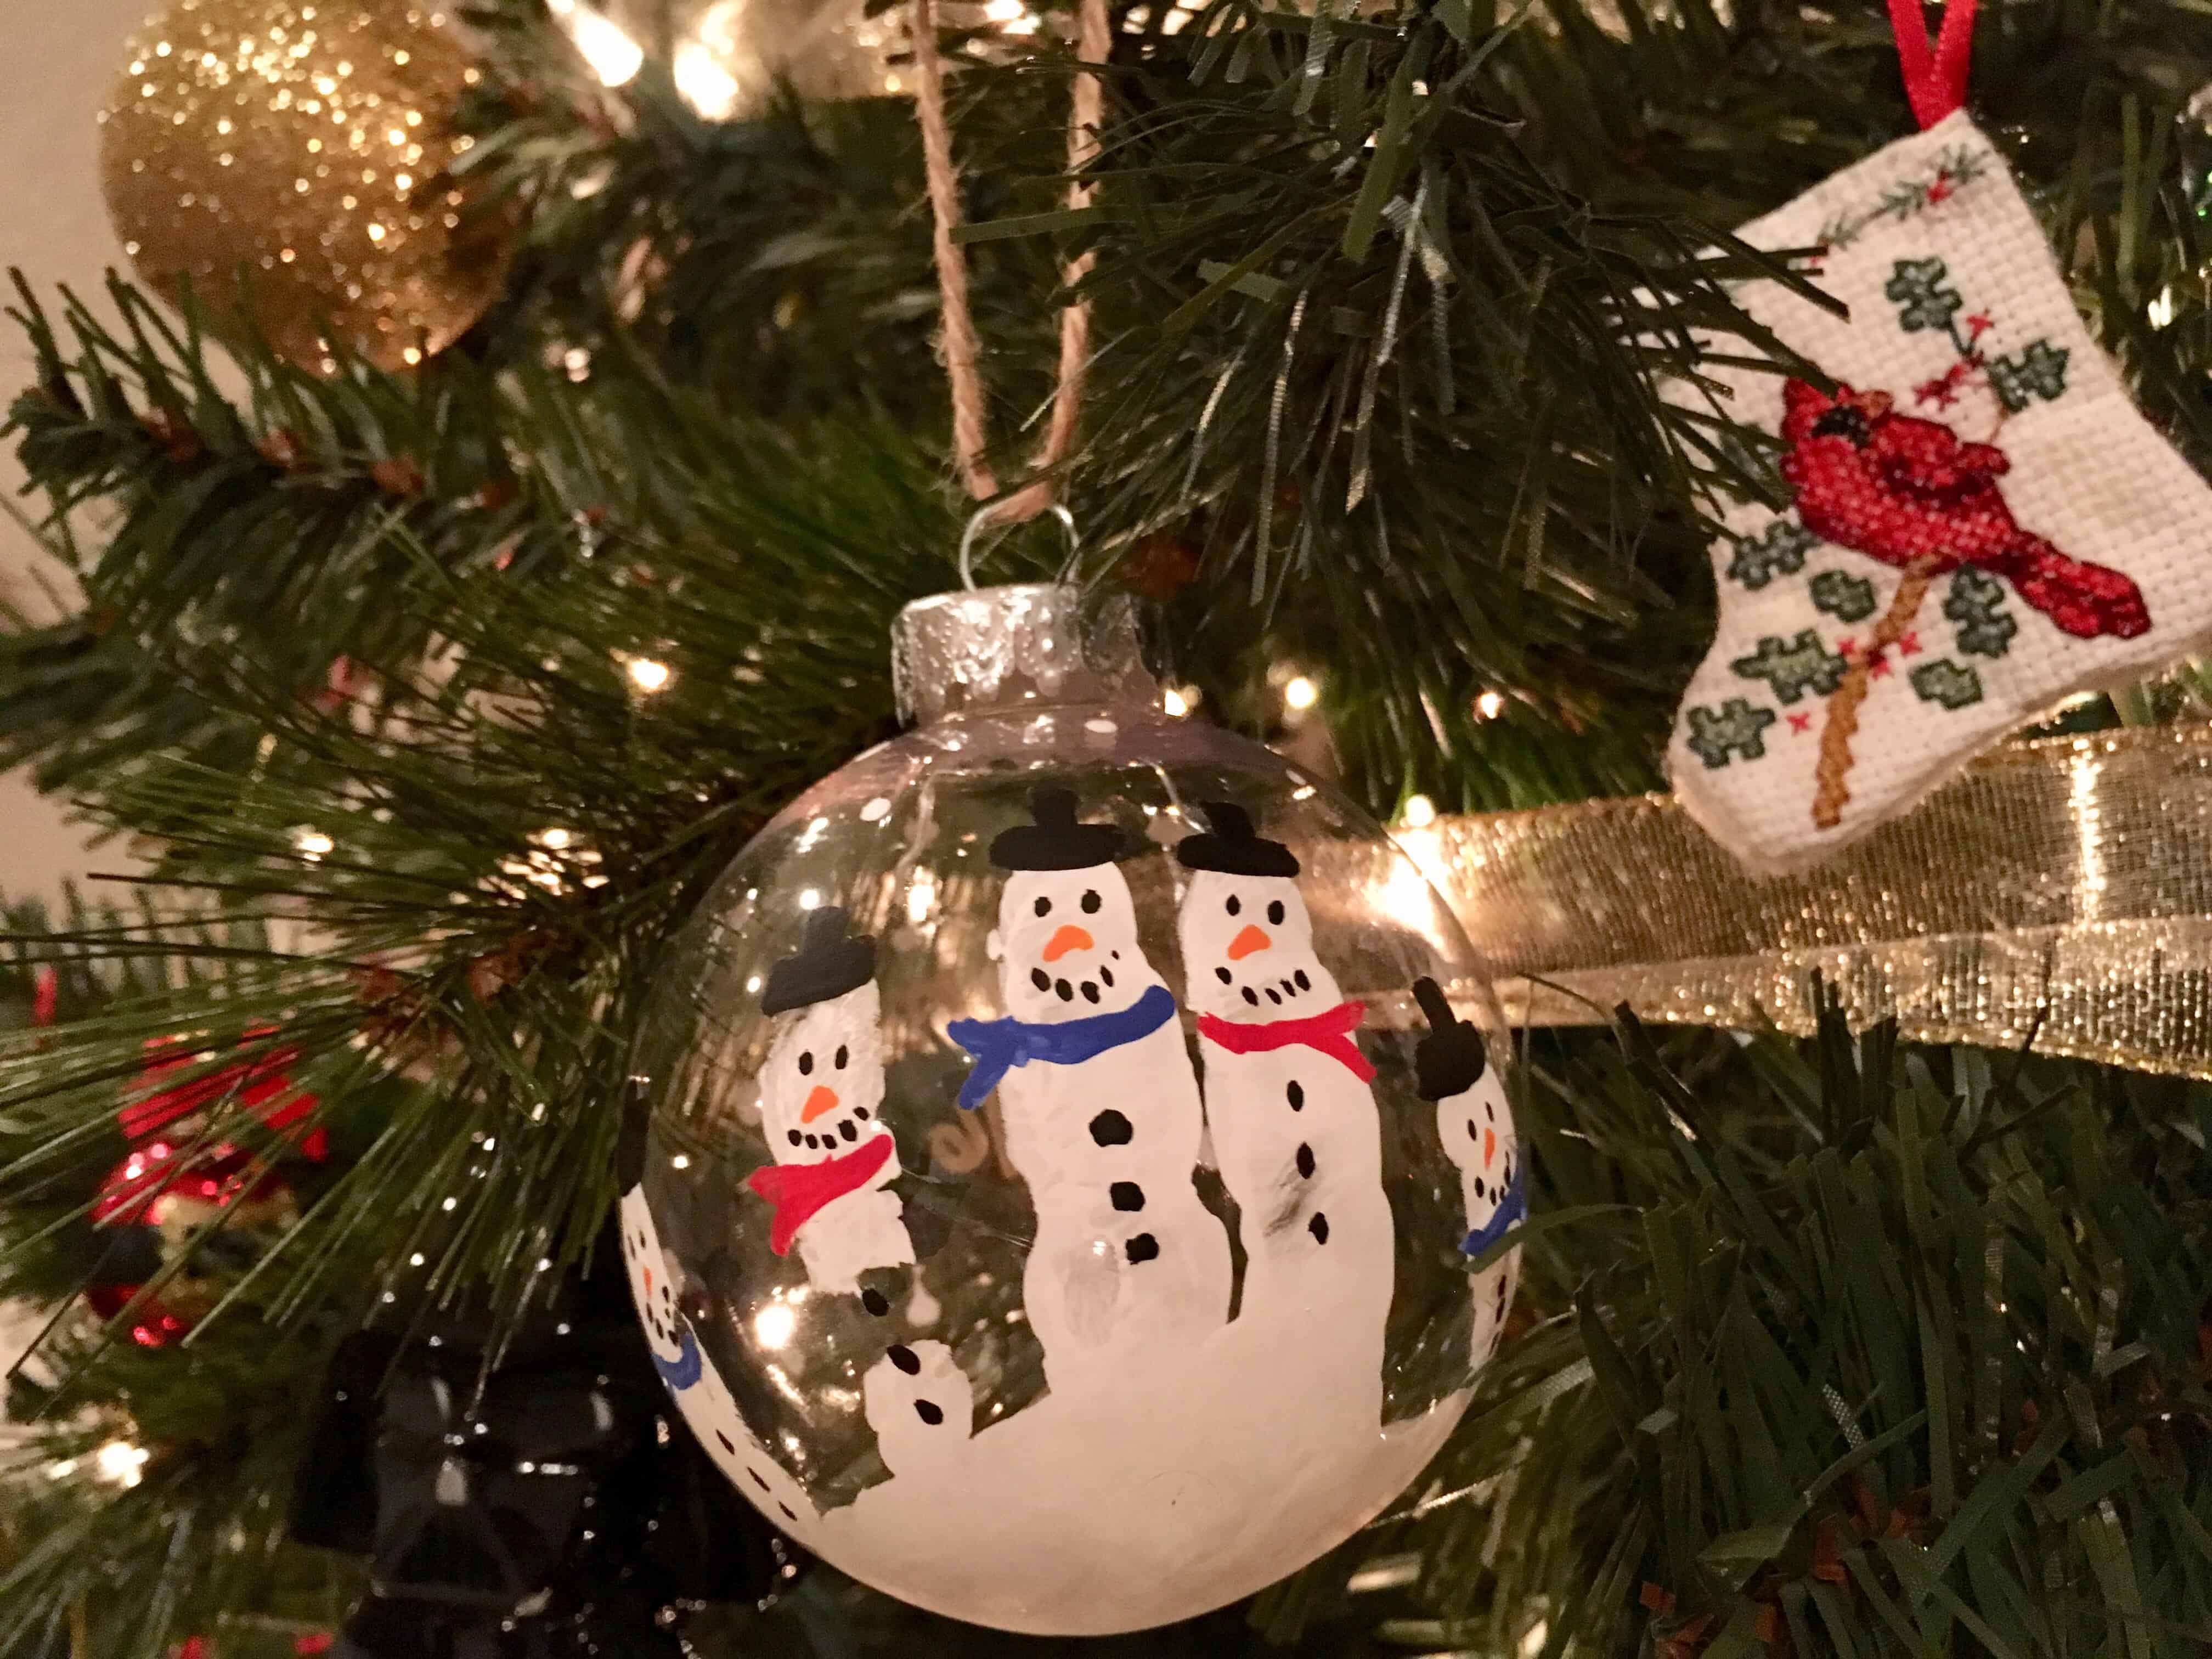 Hand made Christmas ornament on tree